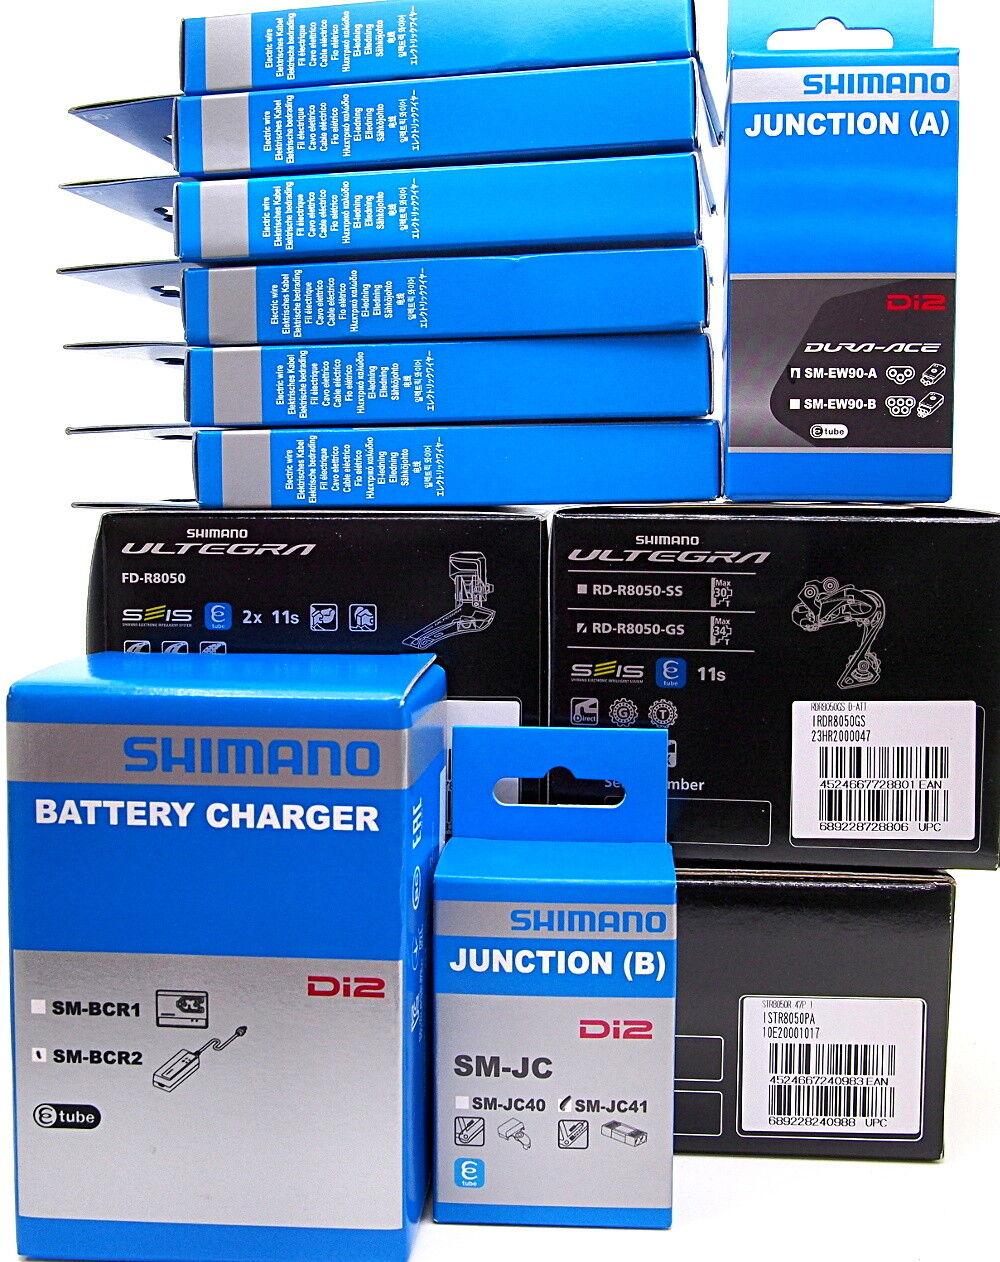 Shimano Ultegra Di2 R8050 Shifter & Derailleurs & EW90-A+JC41 & SM-BCR2 & Wires